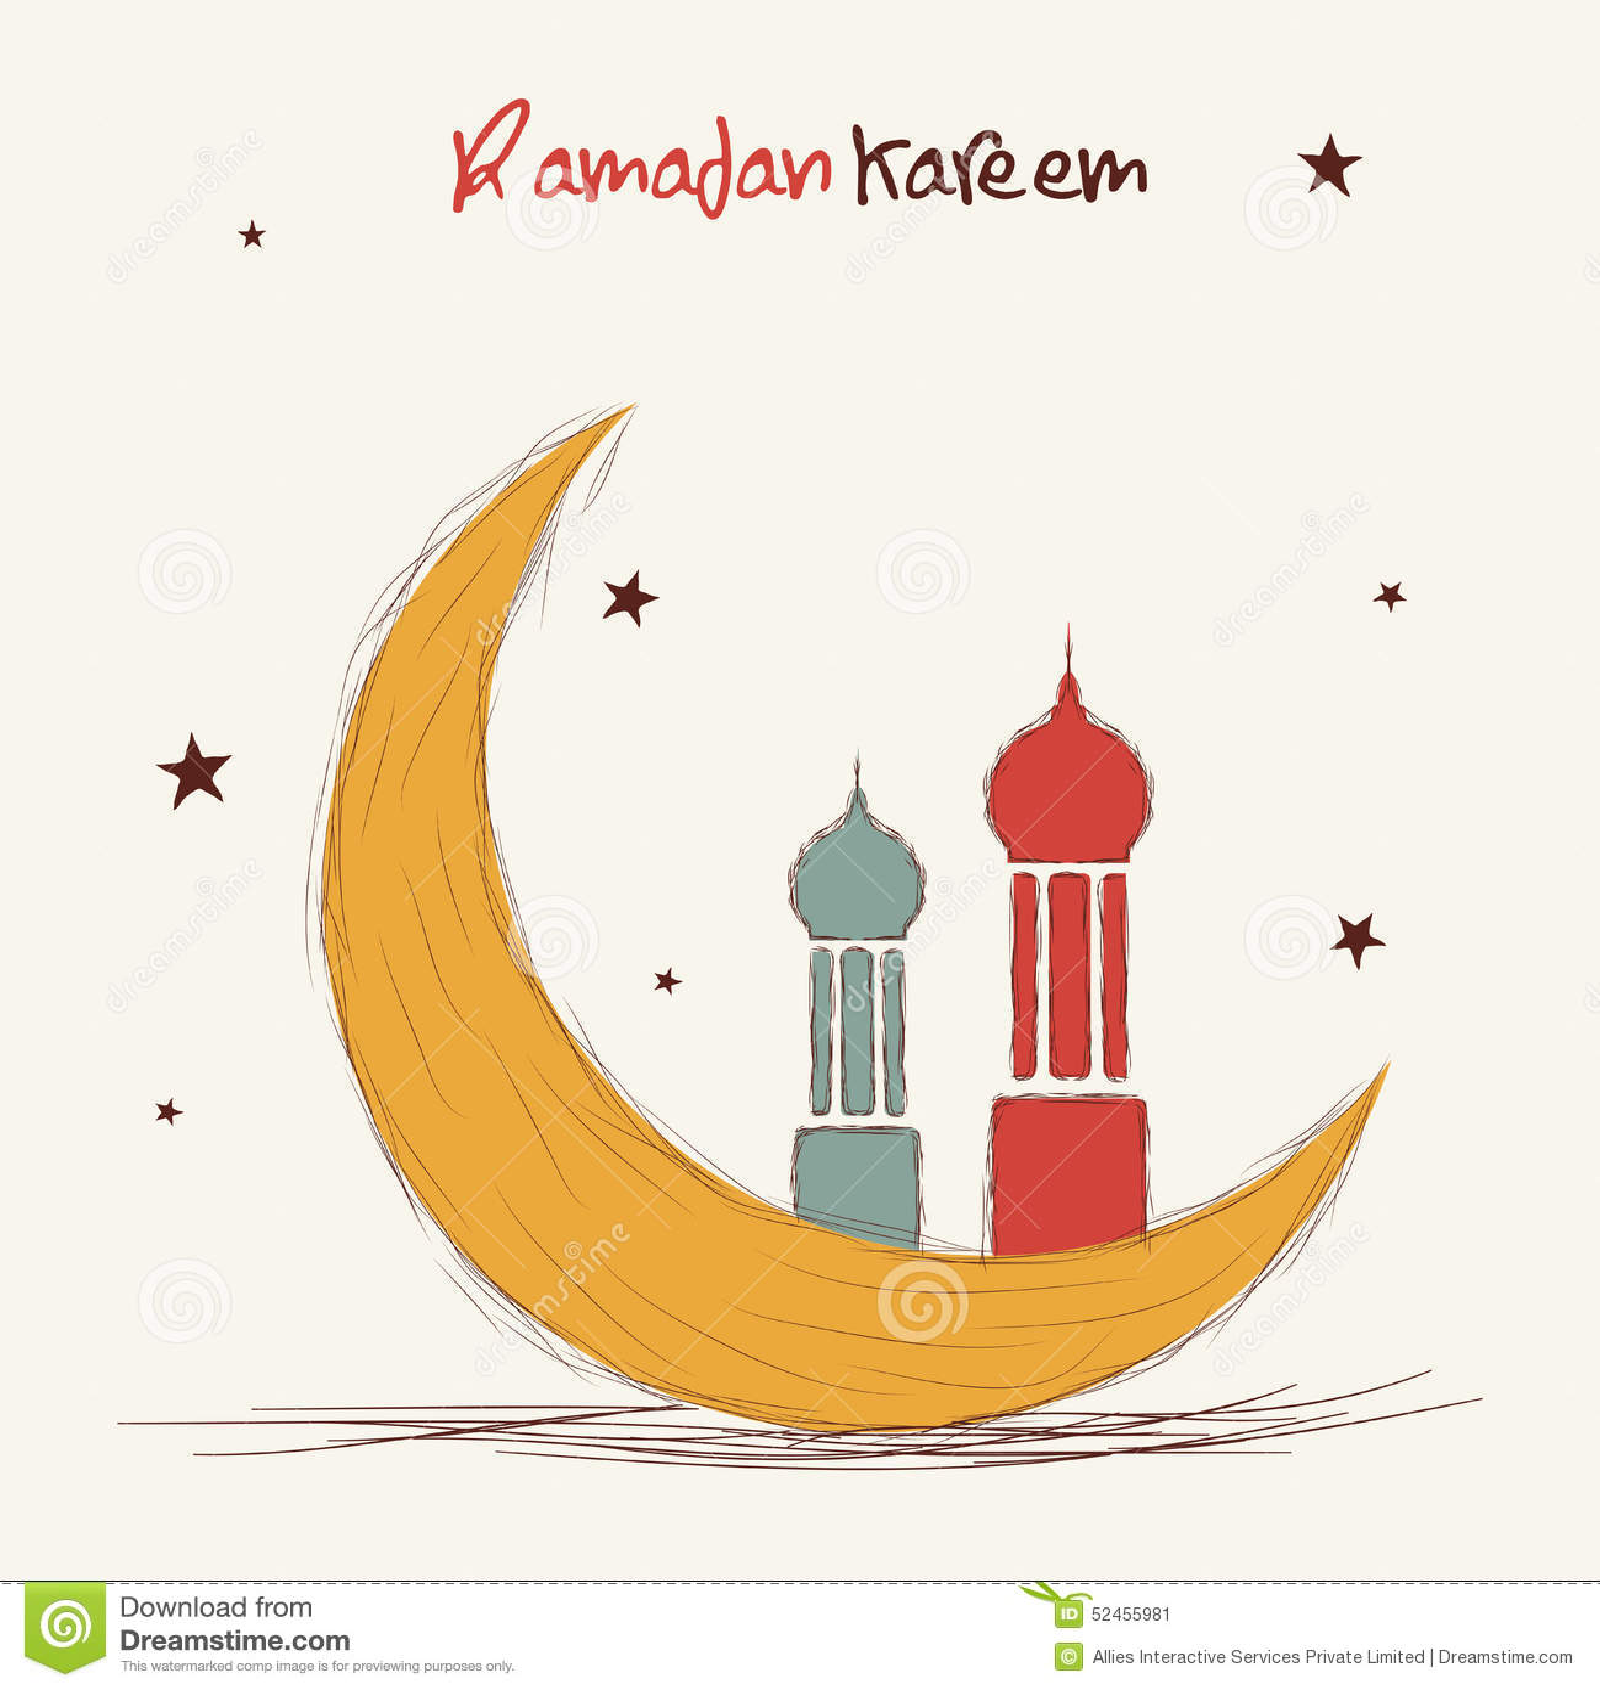 Ramadan kareem celebration with islamic mosque royalty free stock ramadan kareem celebration with islamic mosque royalty free stock image cartoondealer 55592674 kristyandbryce Image collections